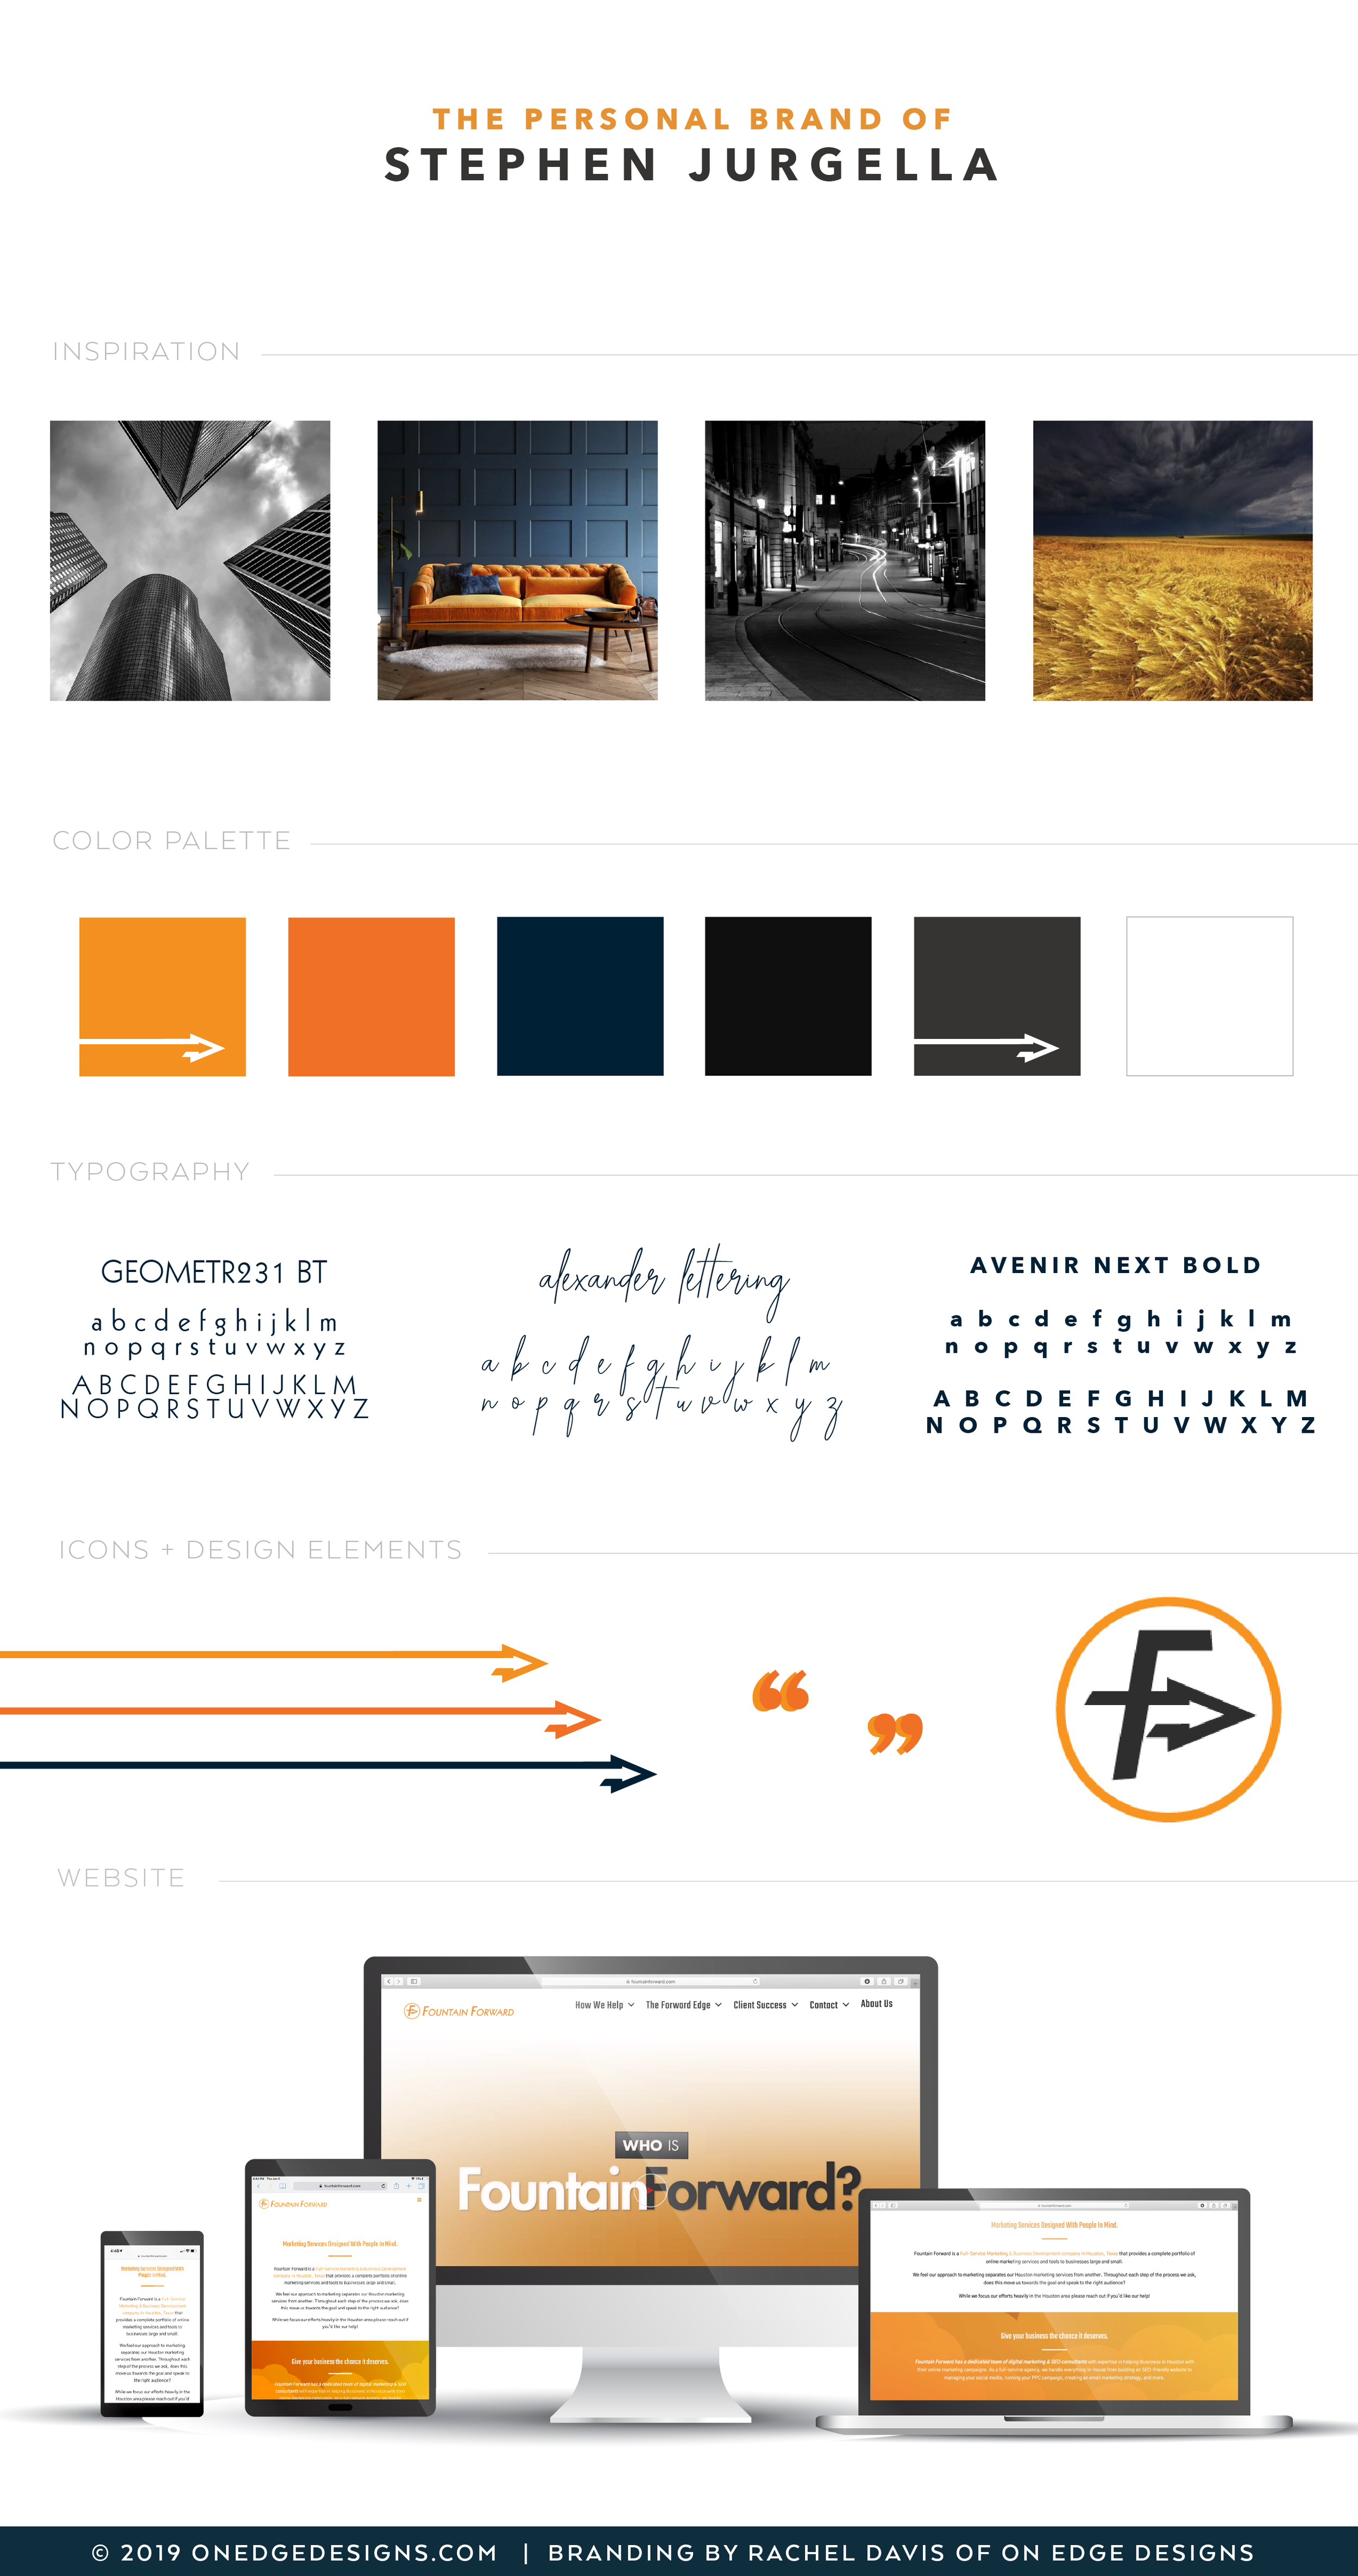 Stephen-Jurgella-brand-standards-01.png